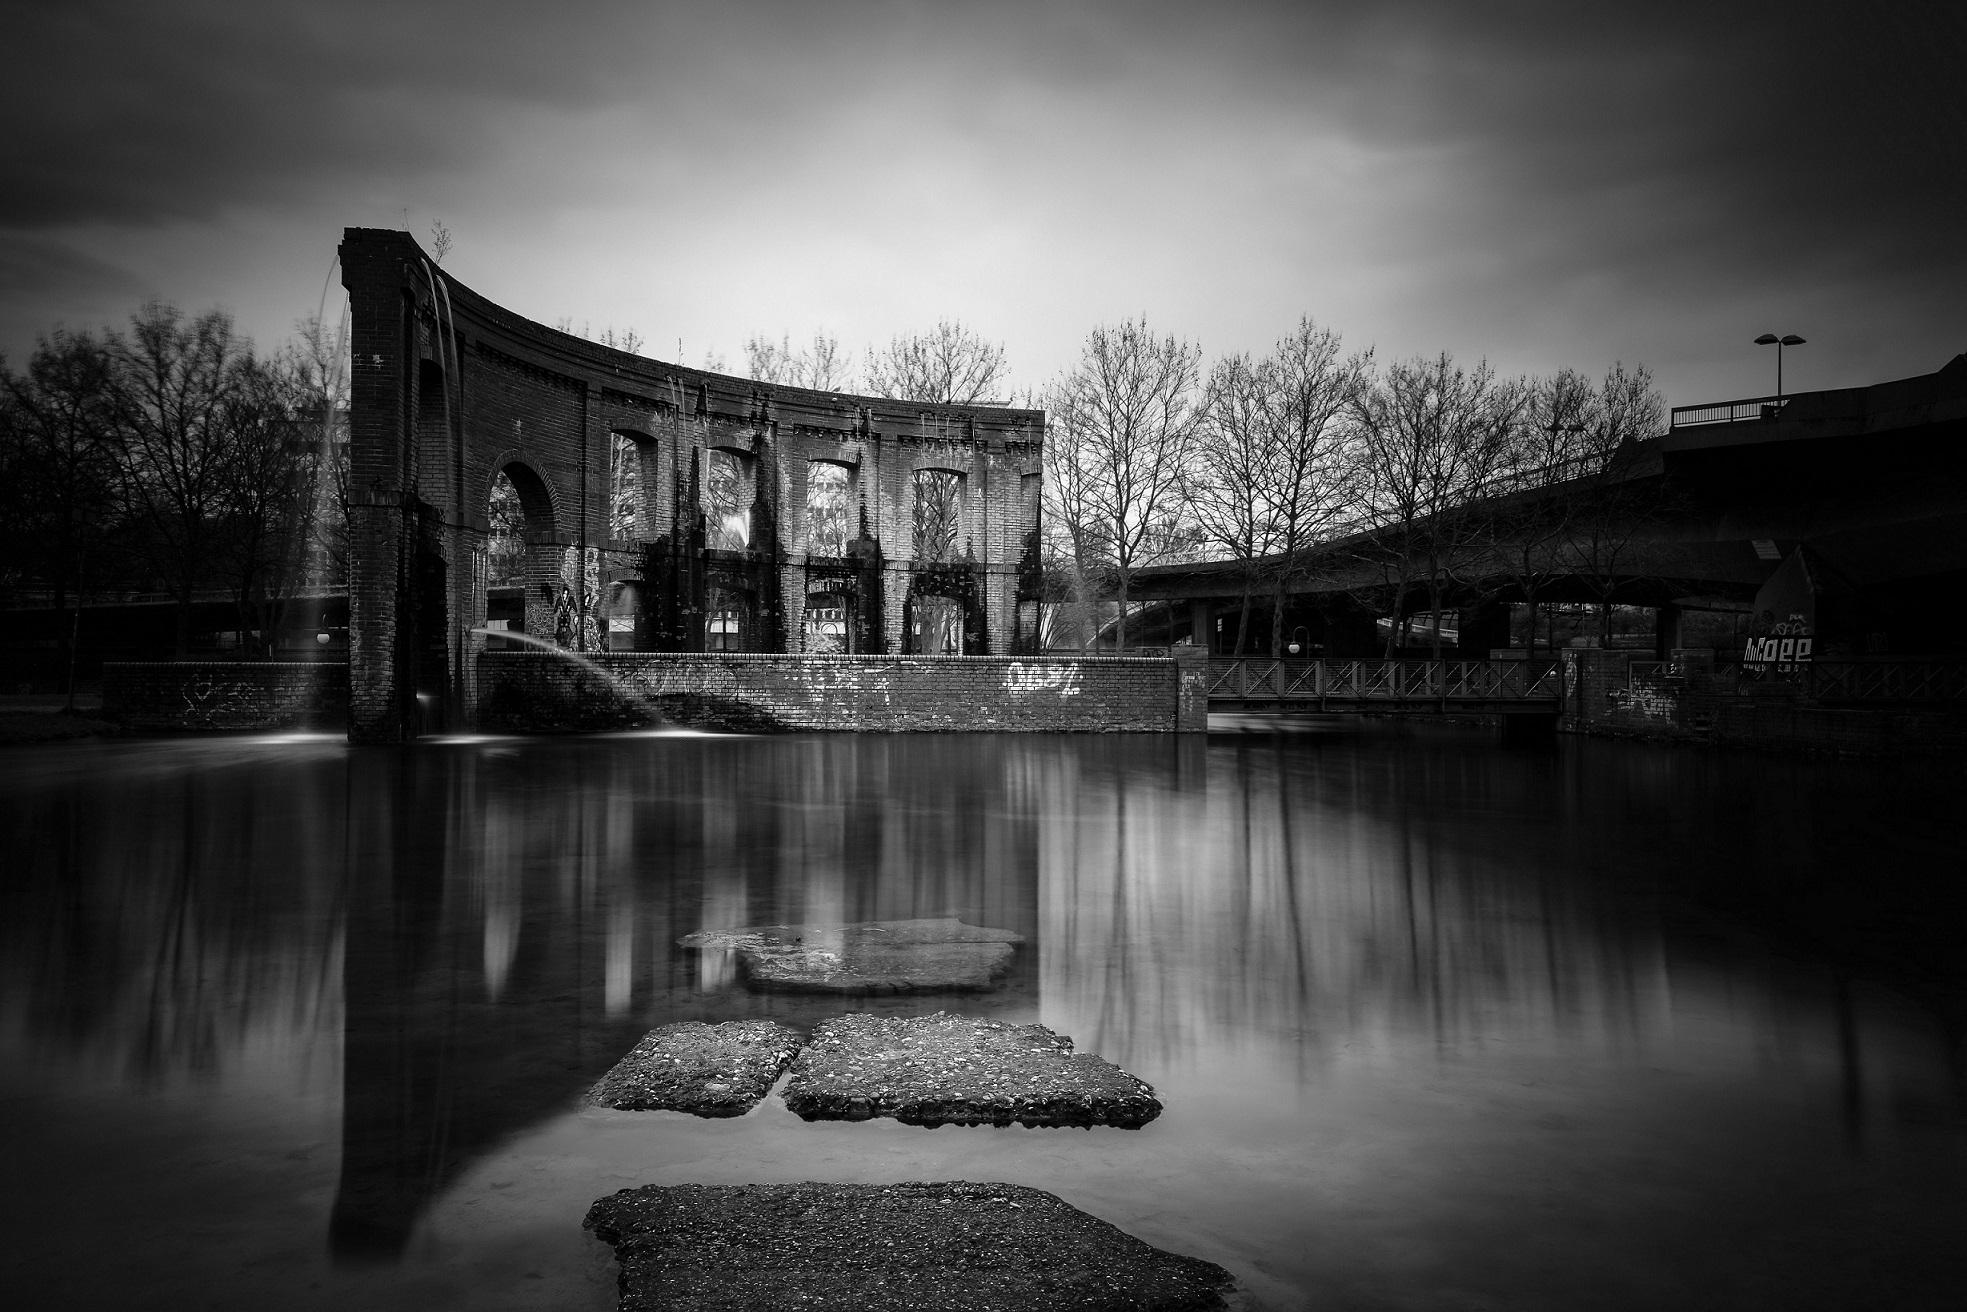 The ruin, Germany